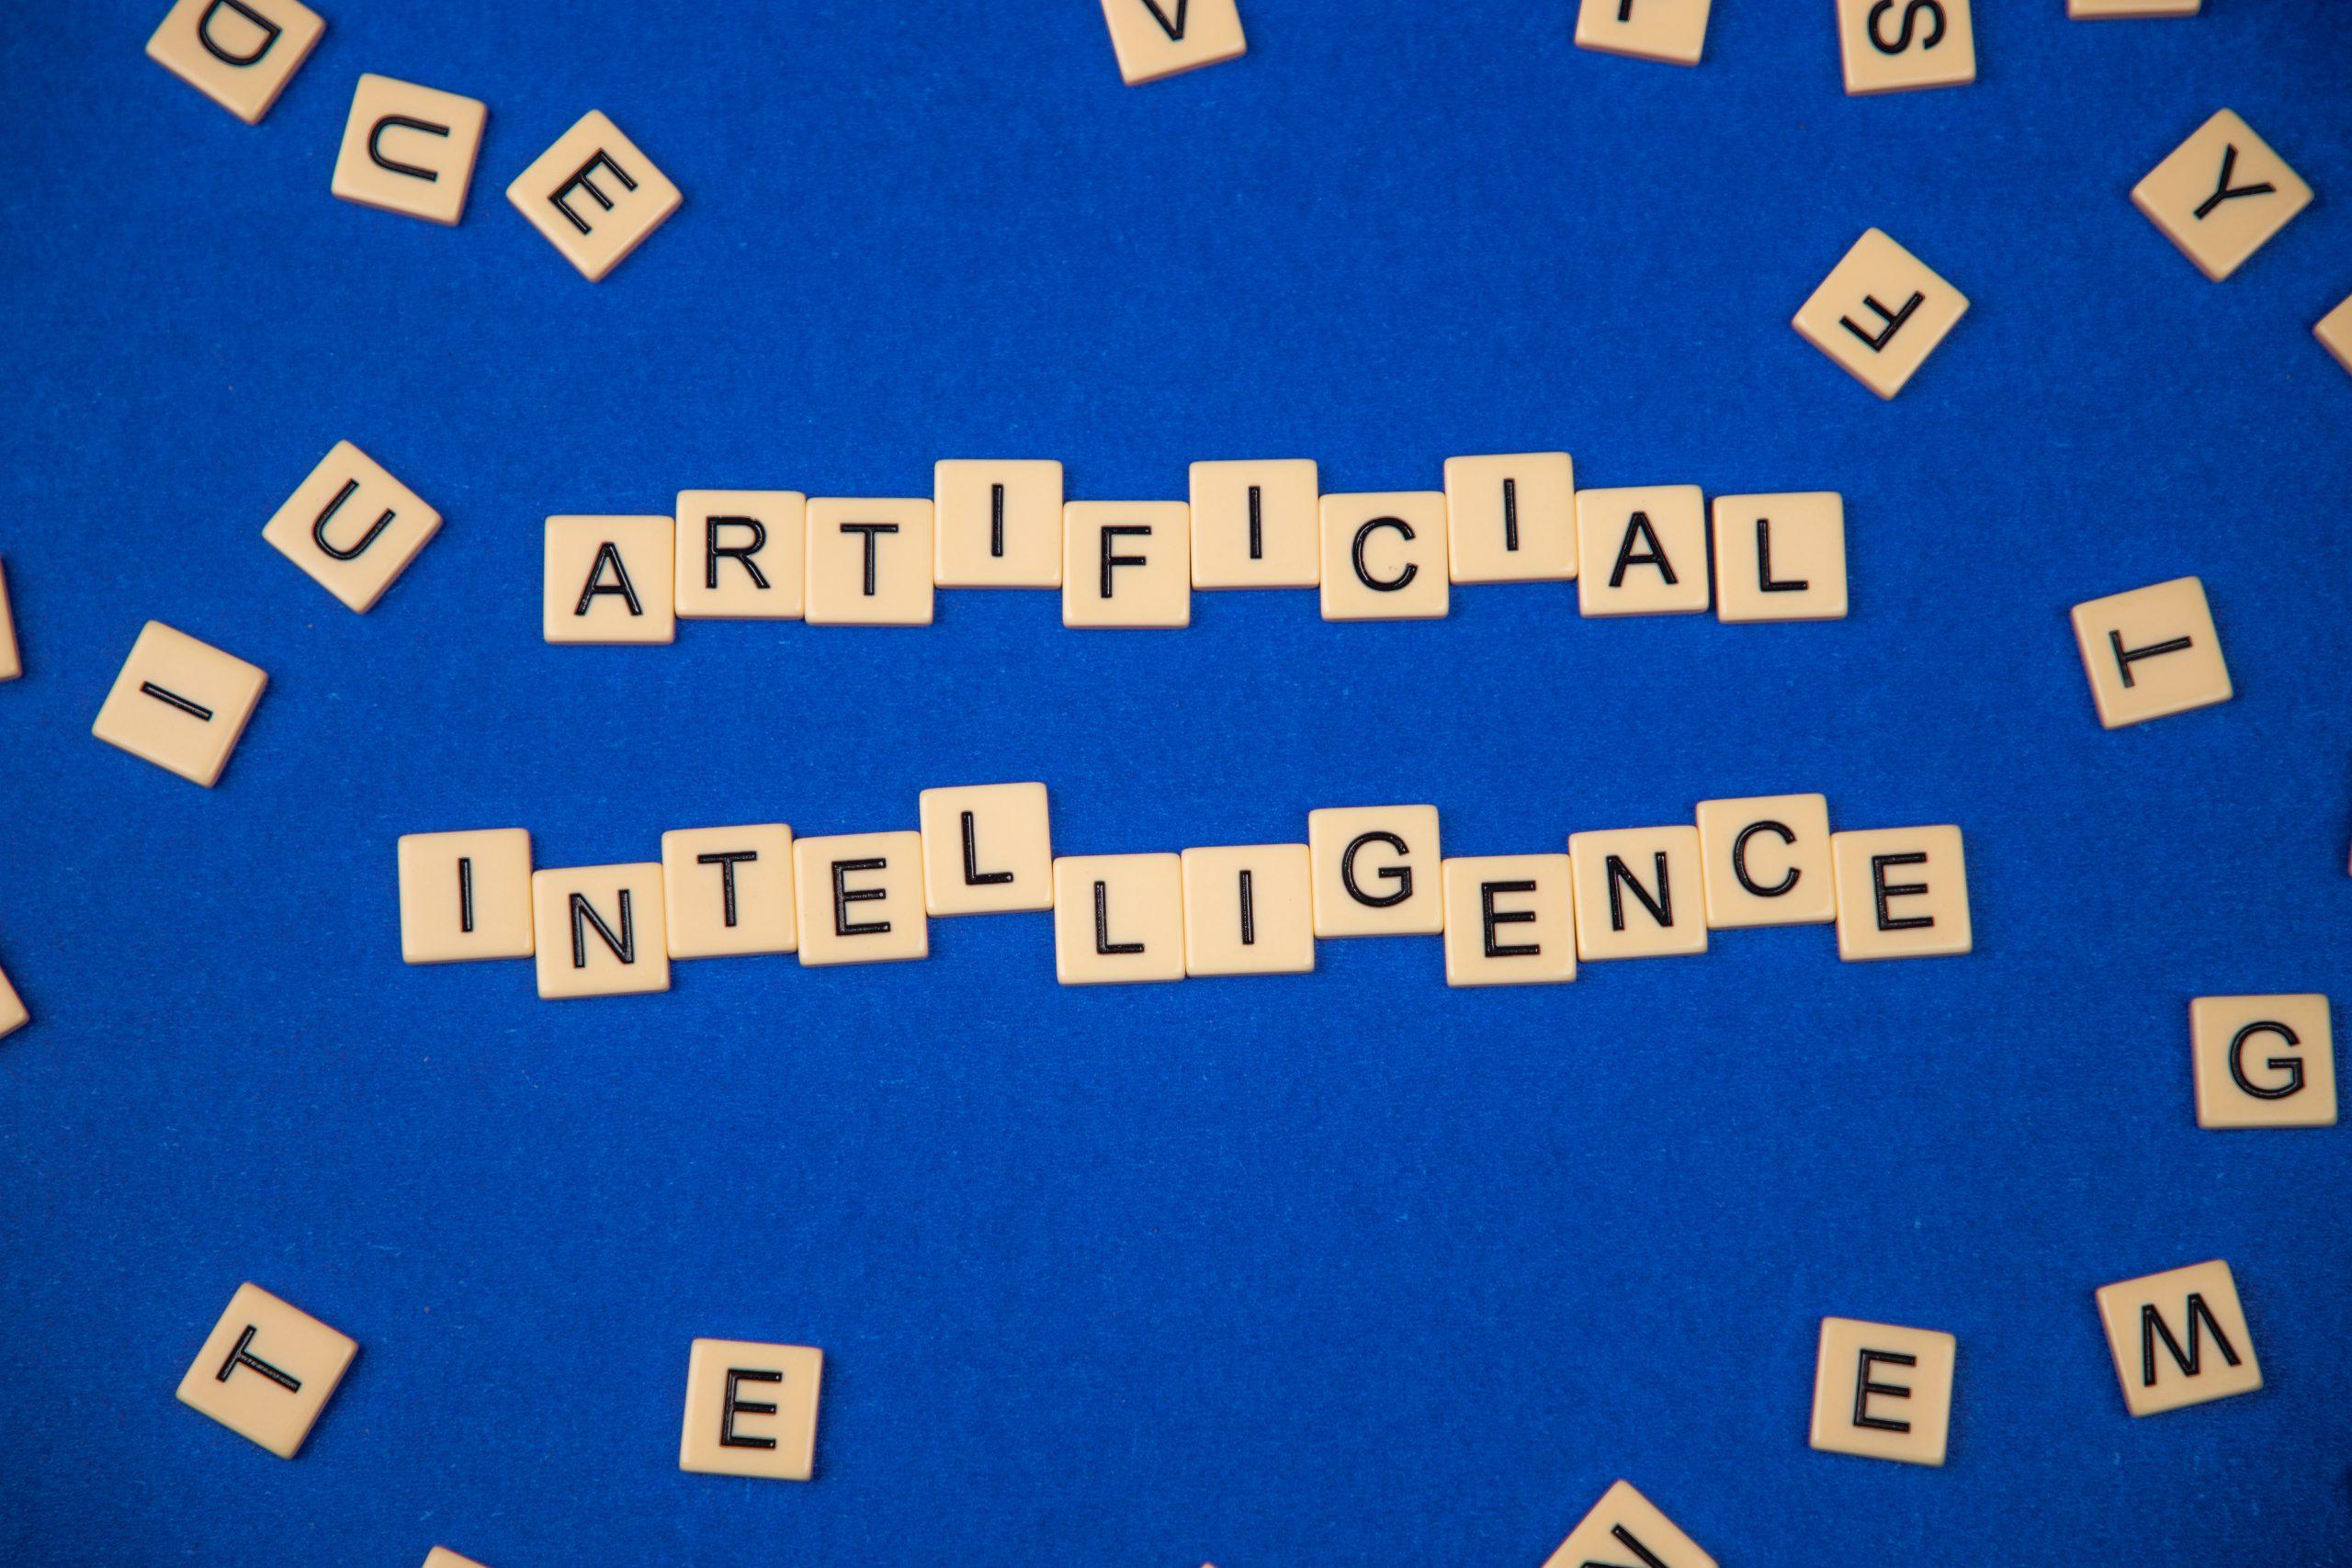 Artificial intelligence on scrabble